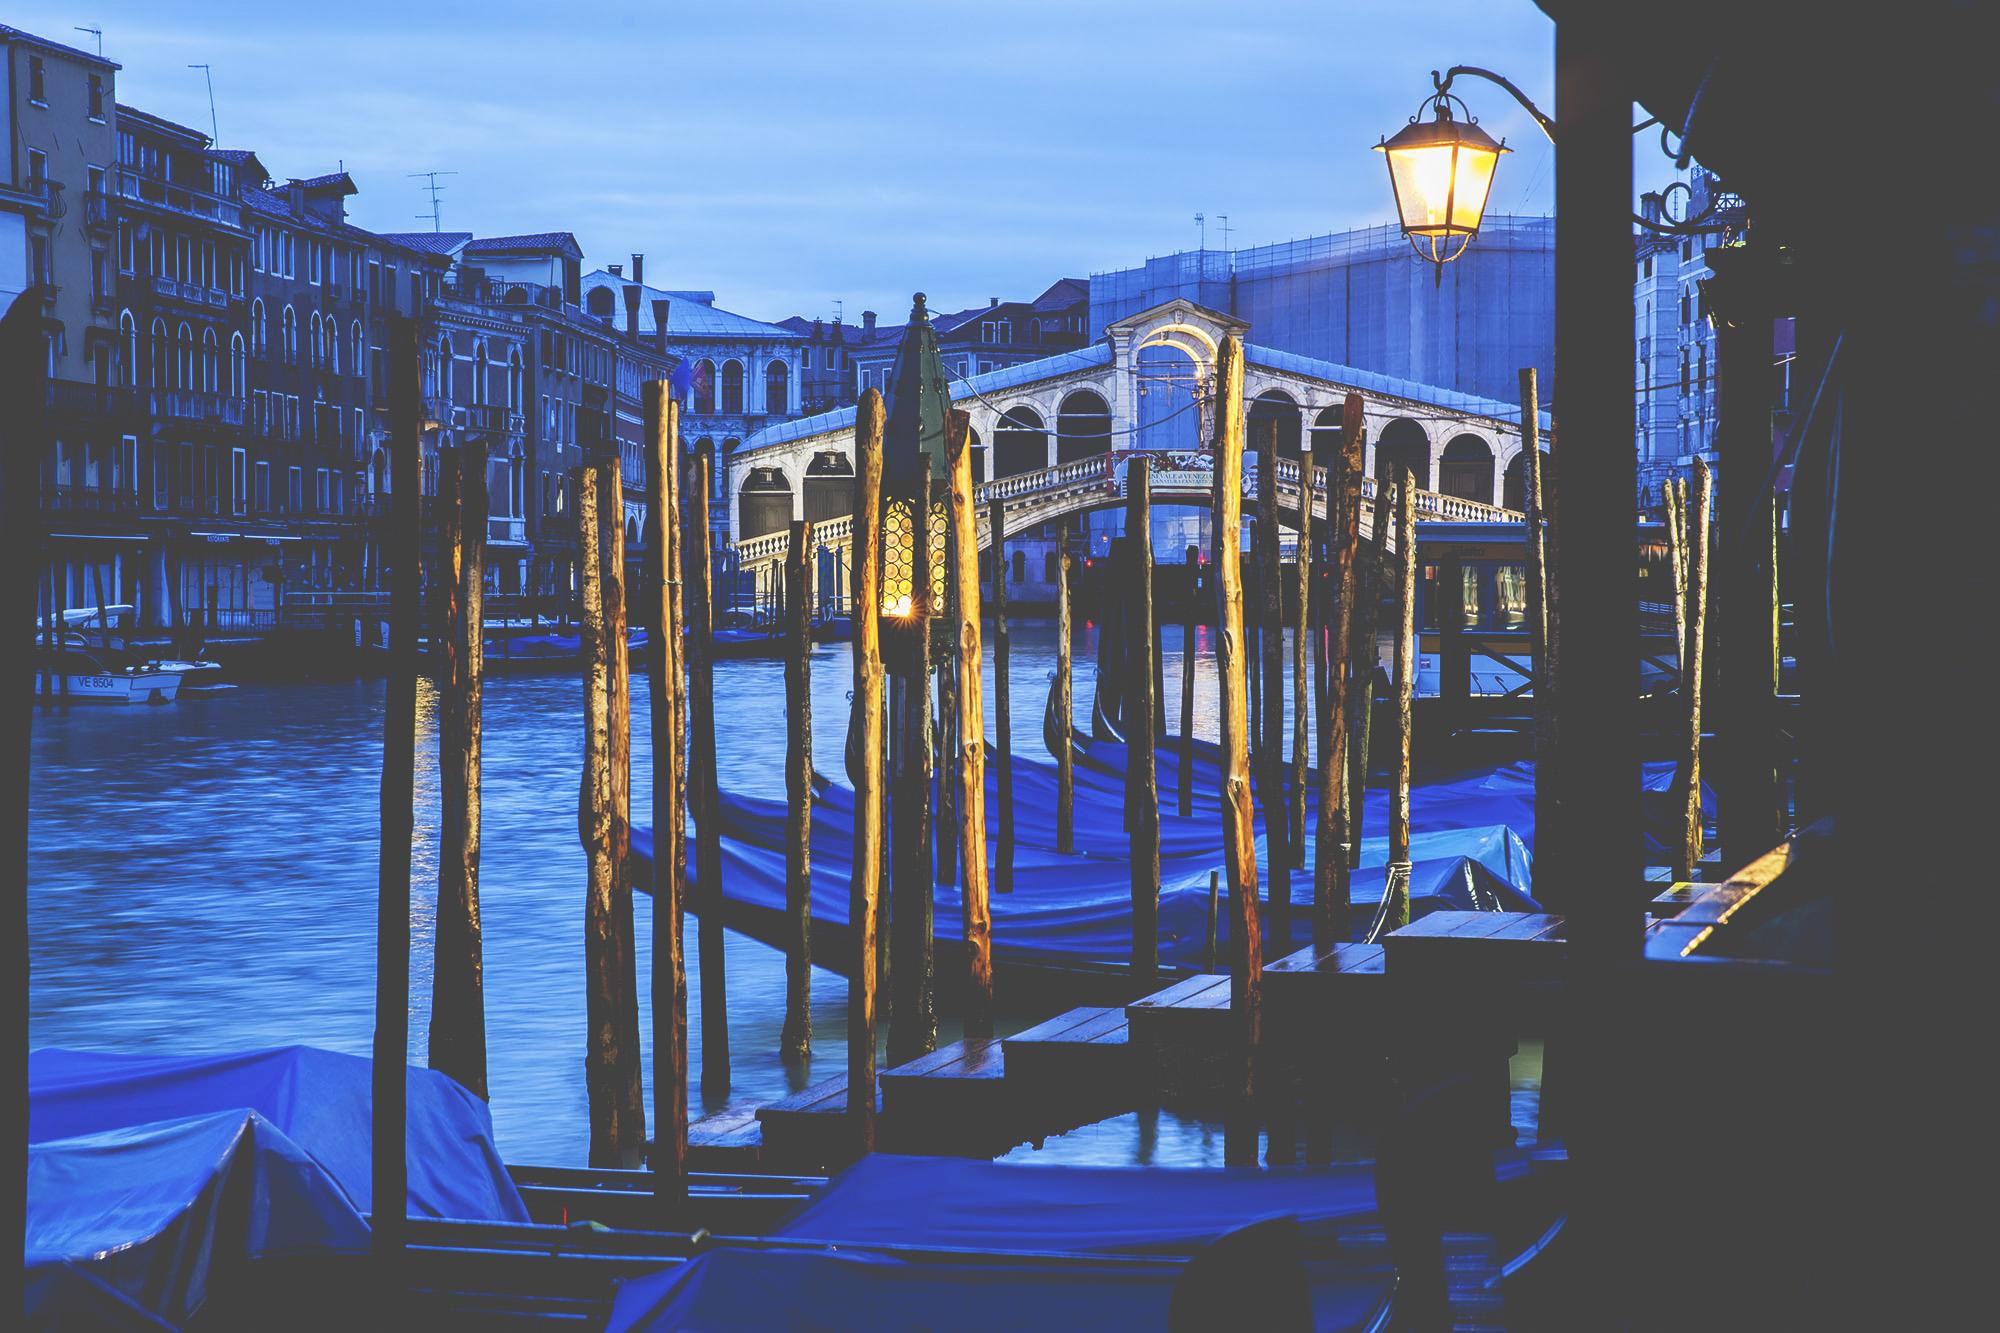 Rialto_Bridge-Venice-Veneto-Italy-Europe-20140301-0040.jpg